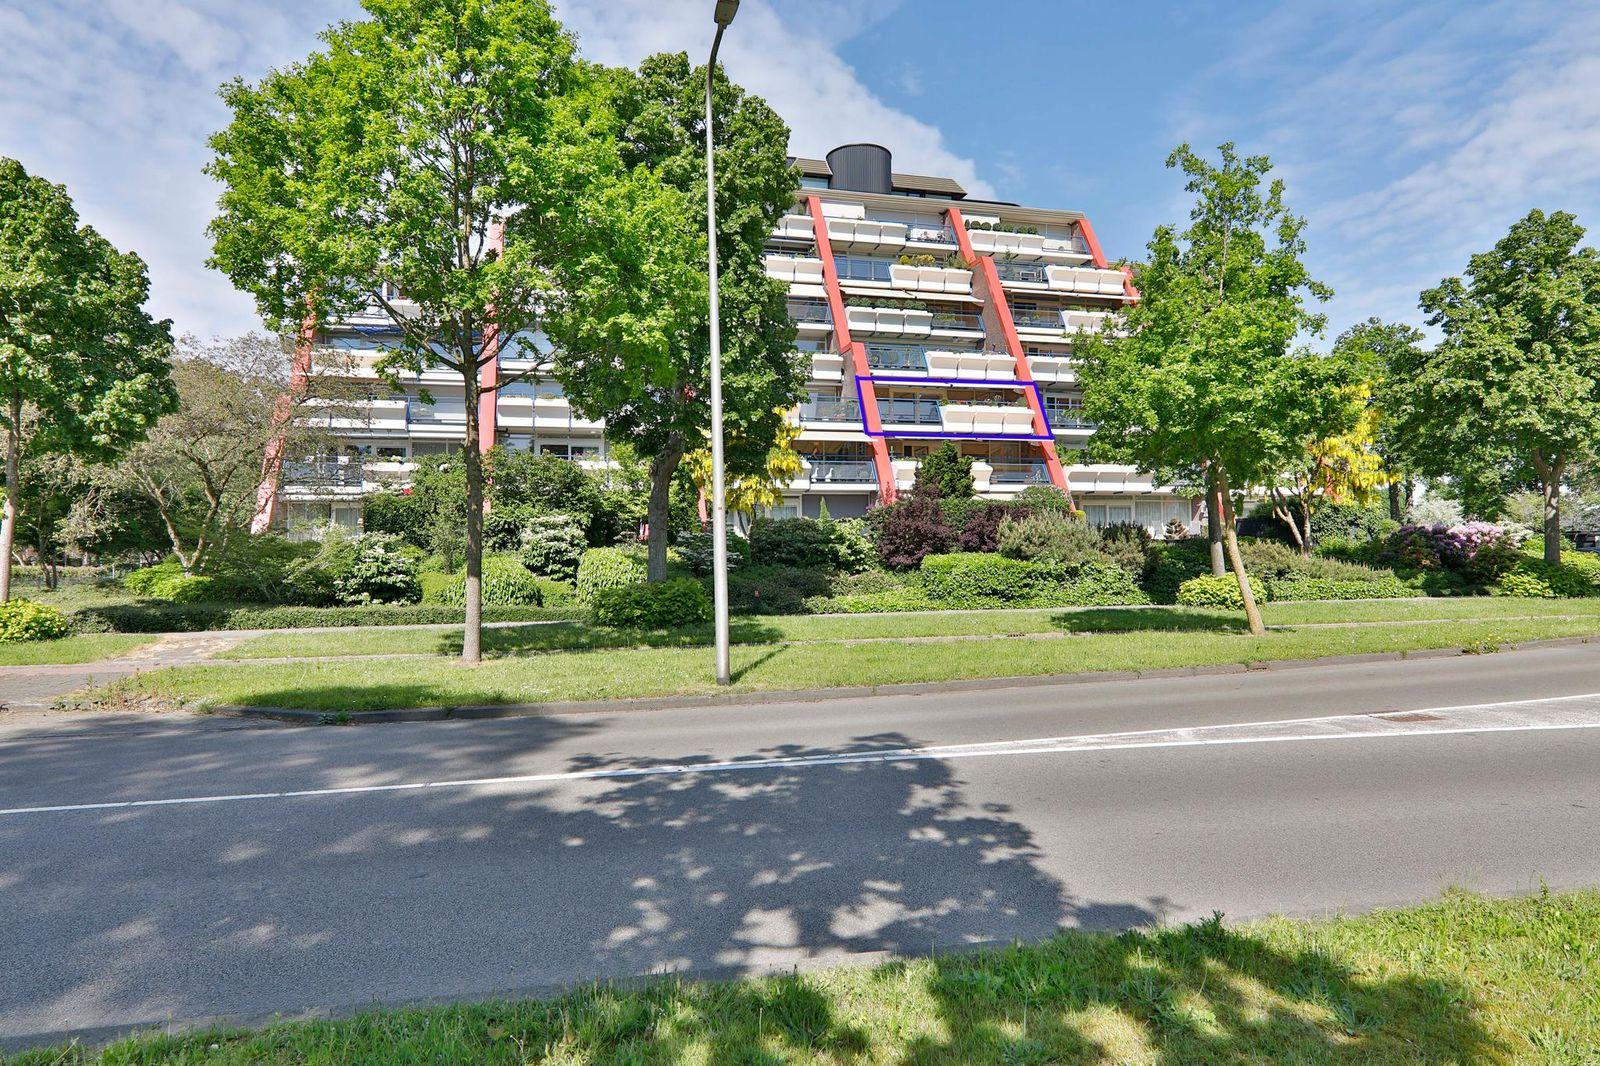 Alteveerstraat 170, Hoogeveen